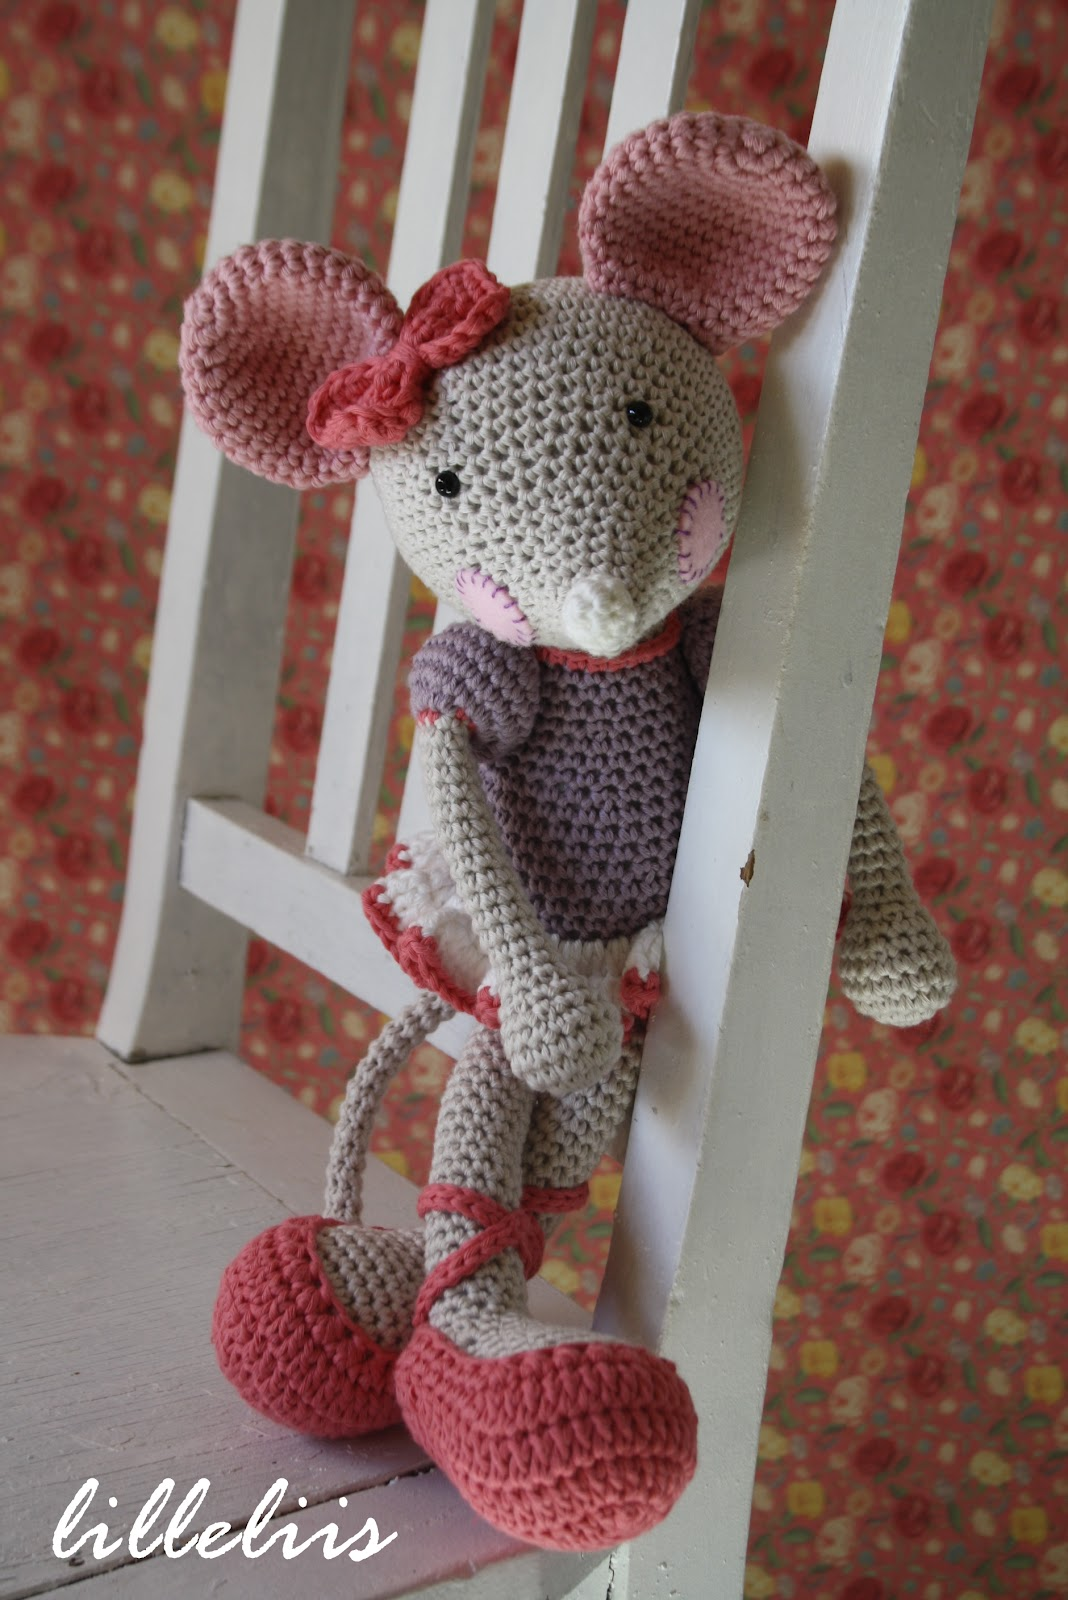 lilleliis.blogspot.com: BALLERINA-MOUSE - organic toys ...